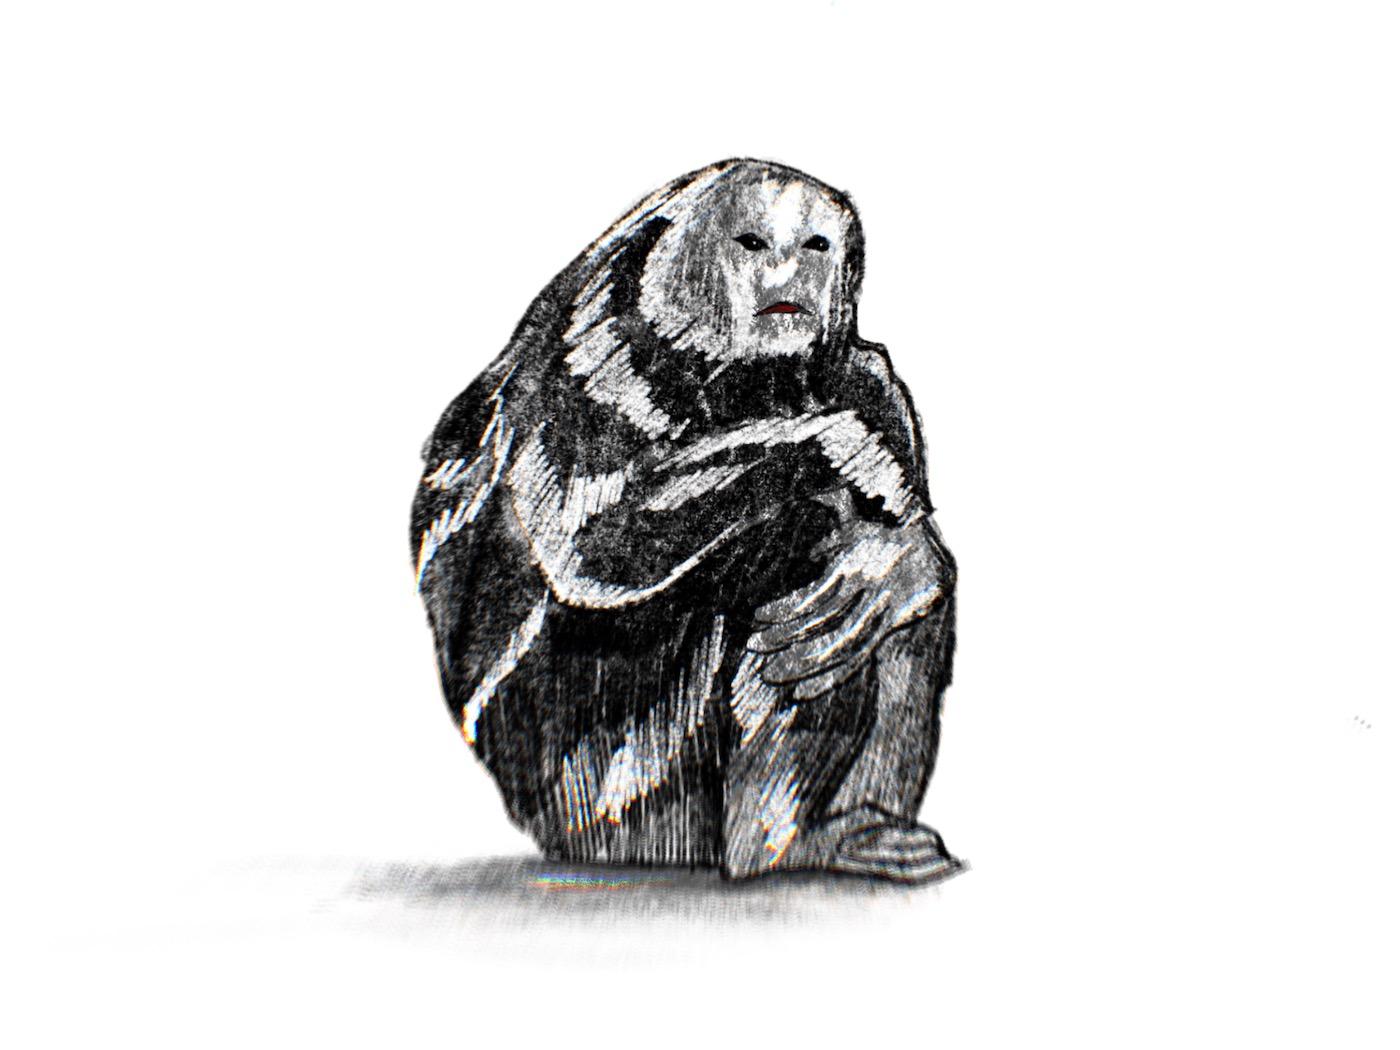 Drawing by Viktoriia Shcherbak of huddling golem.